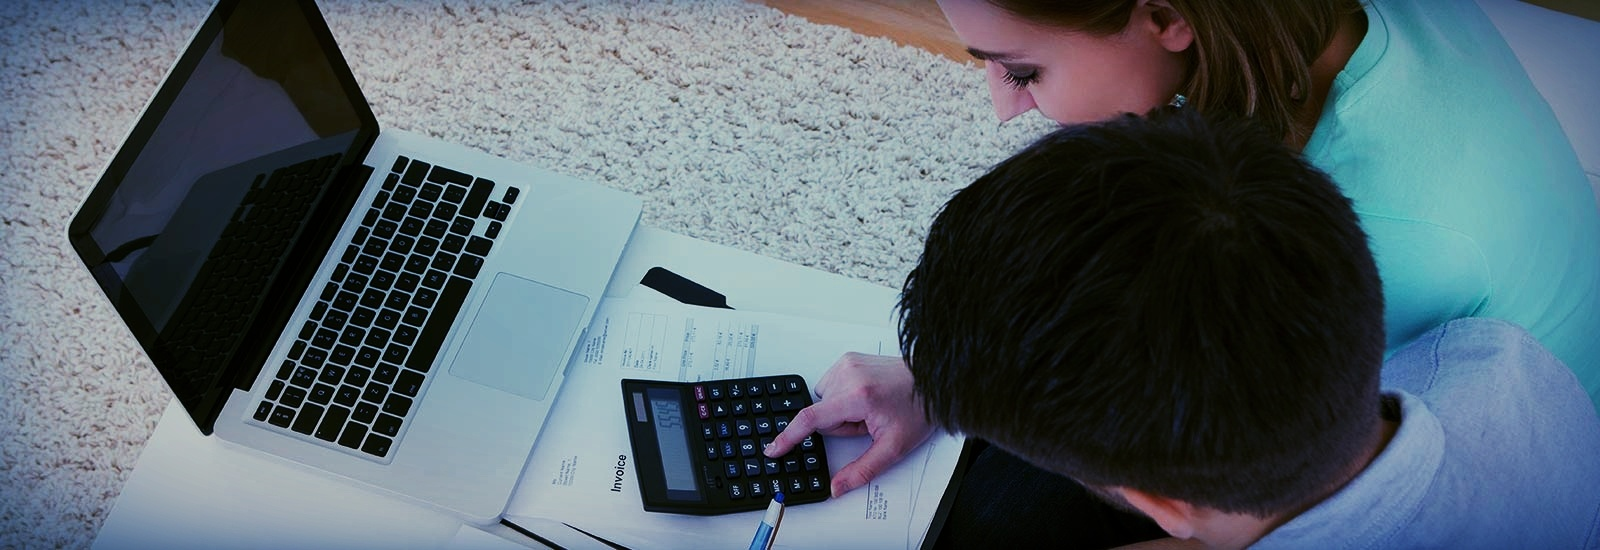 NSLU-article-title-bg-proven-strategy-reduce-debt-557897-edited.jpg